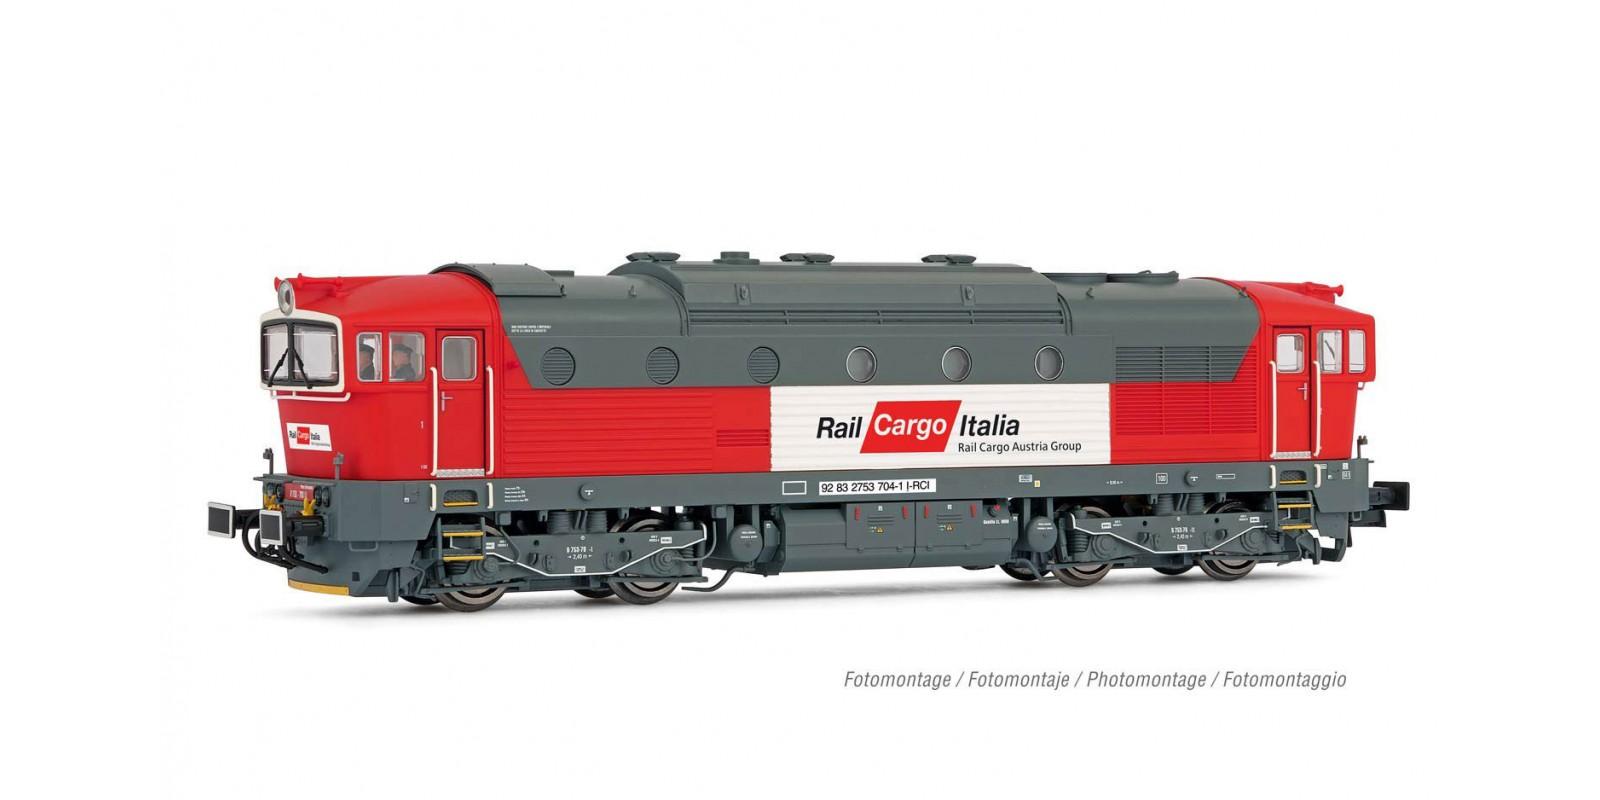 RI2863 Rail Cargo Italia, diesel locomotive class D753.7, red/light grey livery, period V-VI